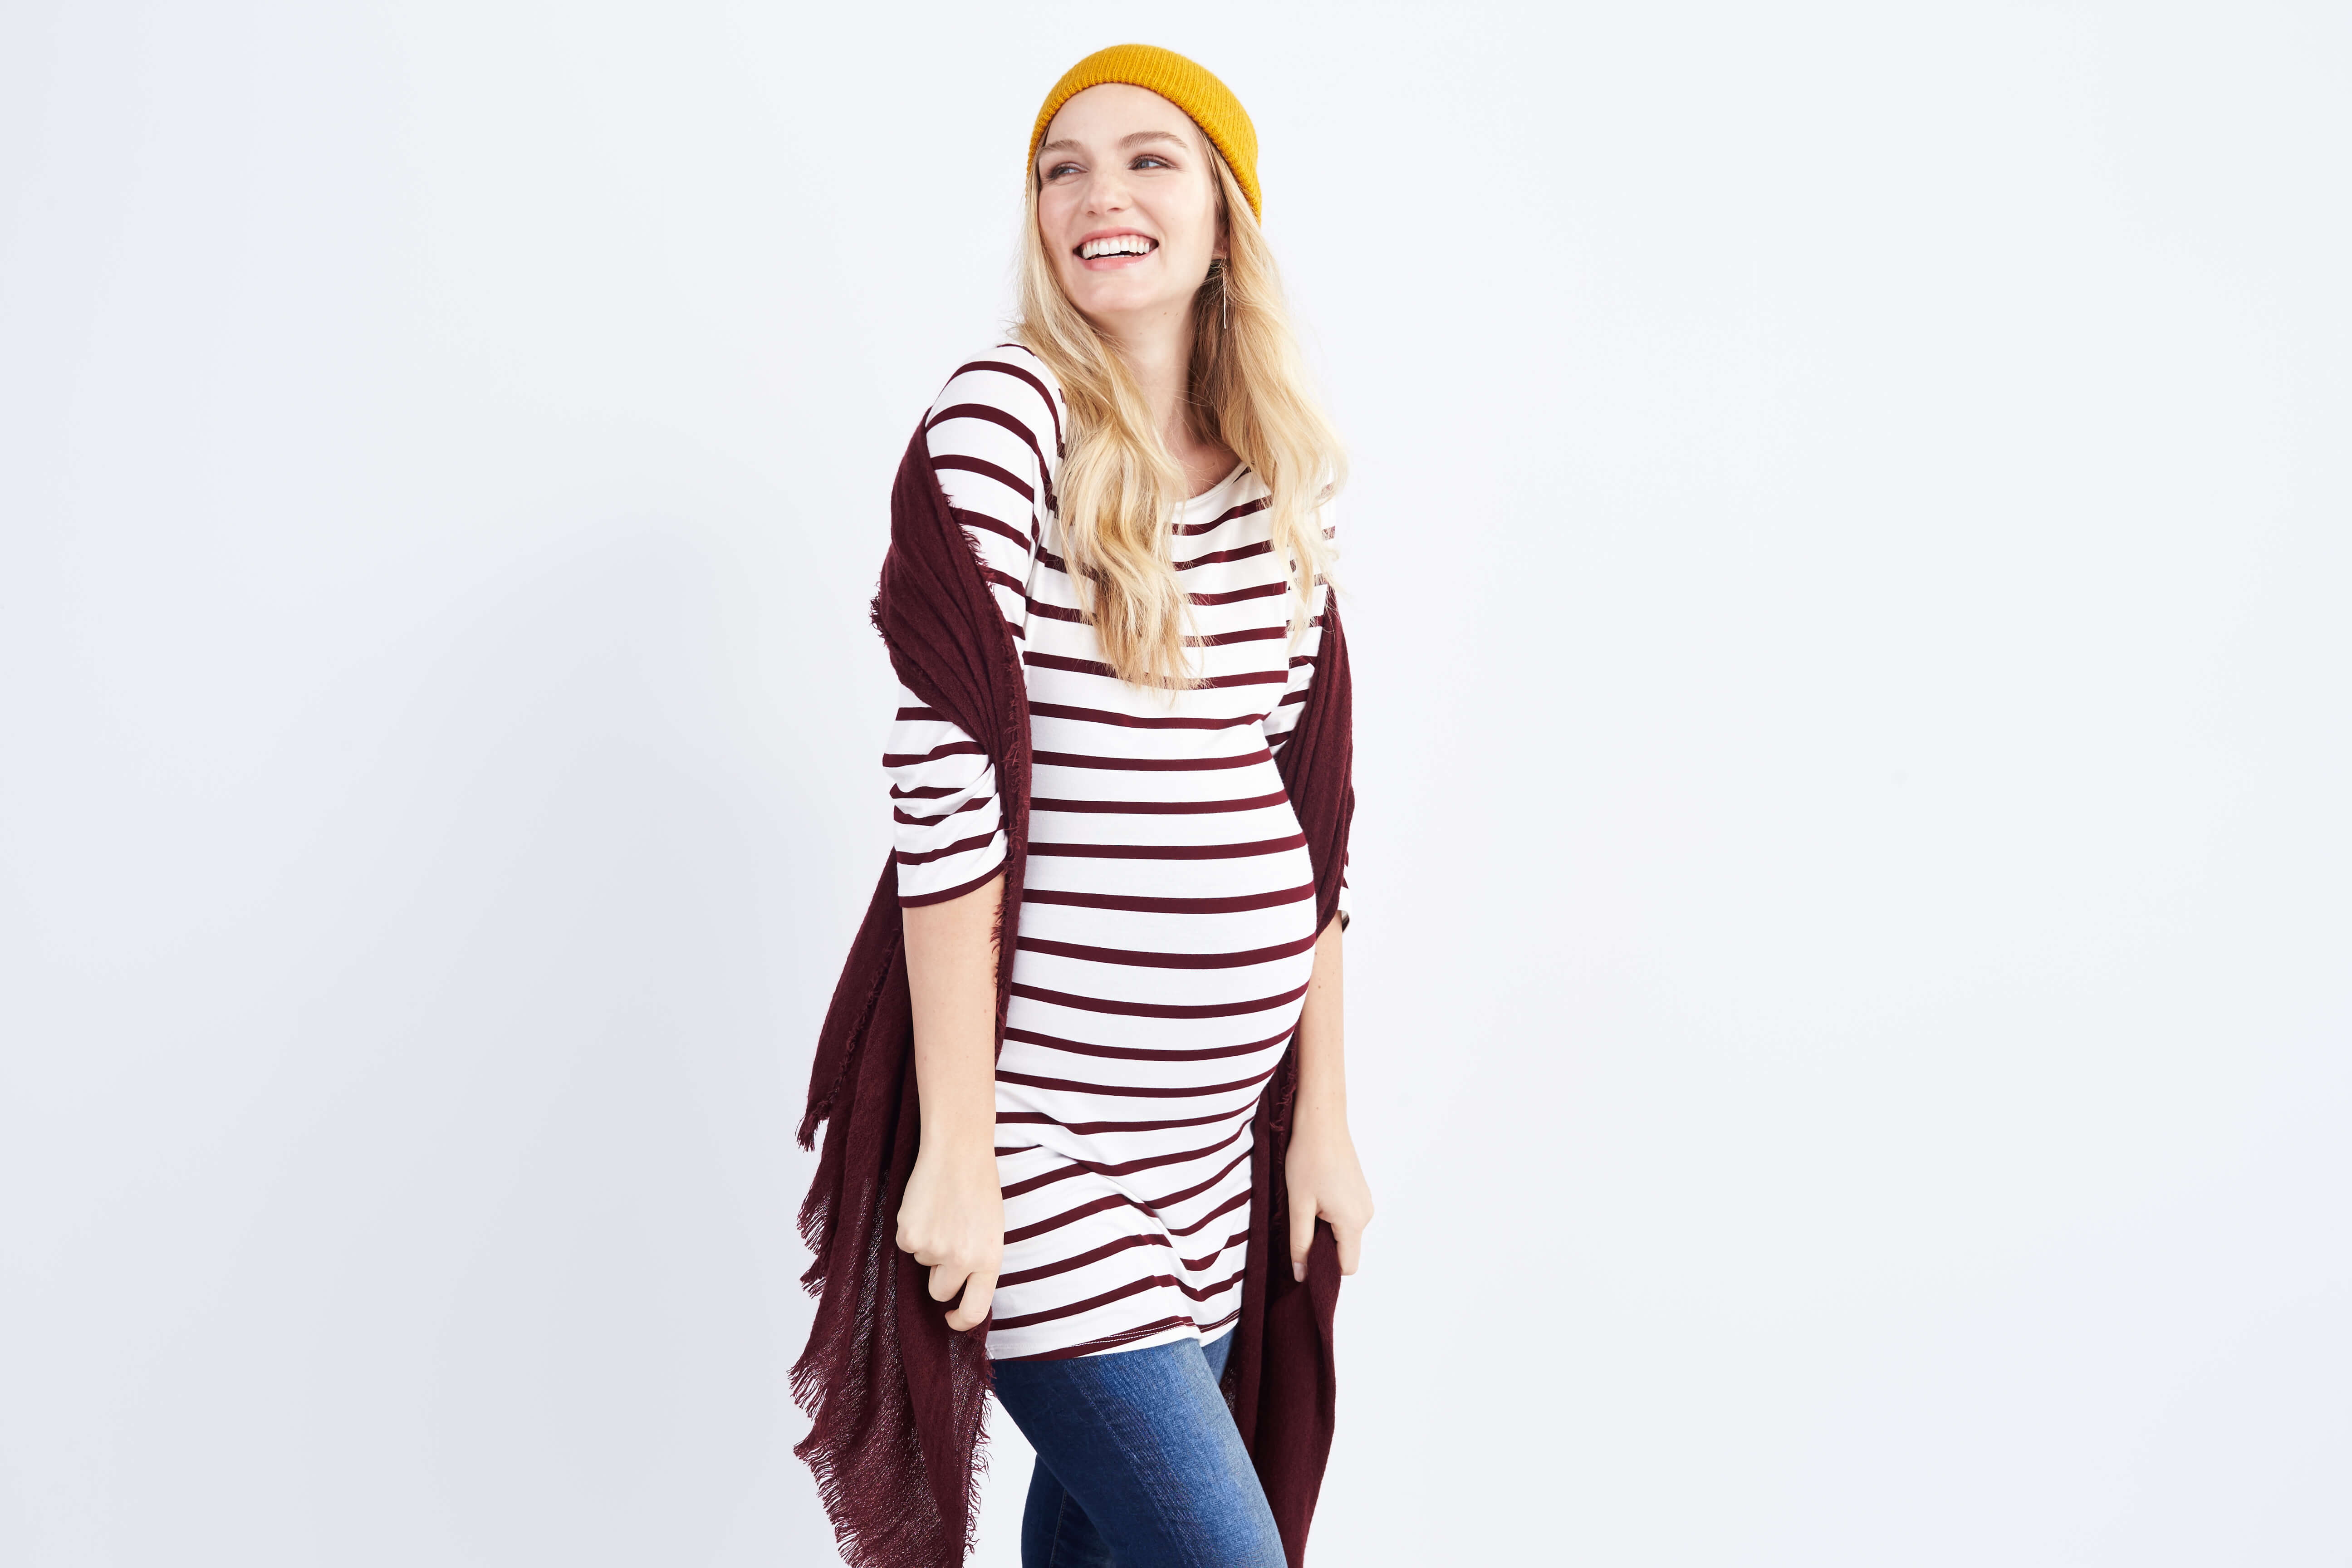 10 Maternity Style Tips To Maximize Your Wardrobe